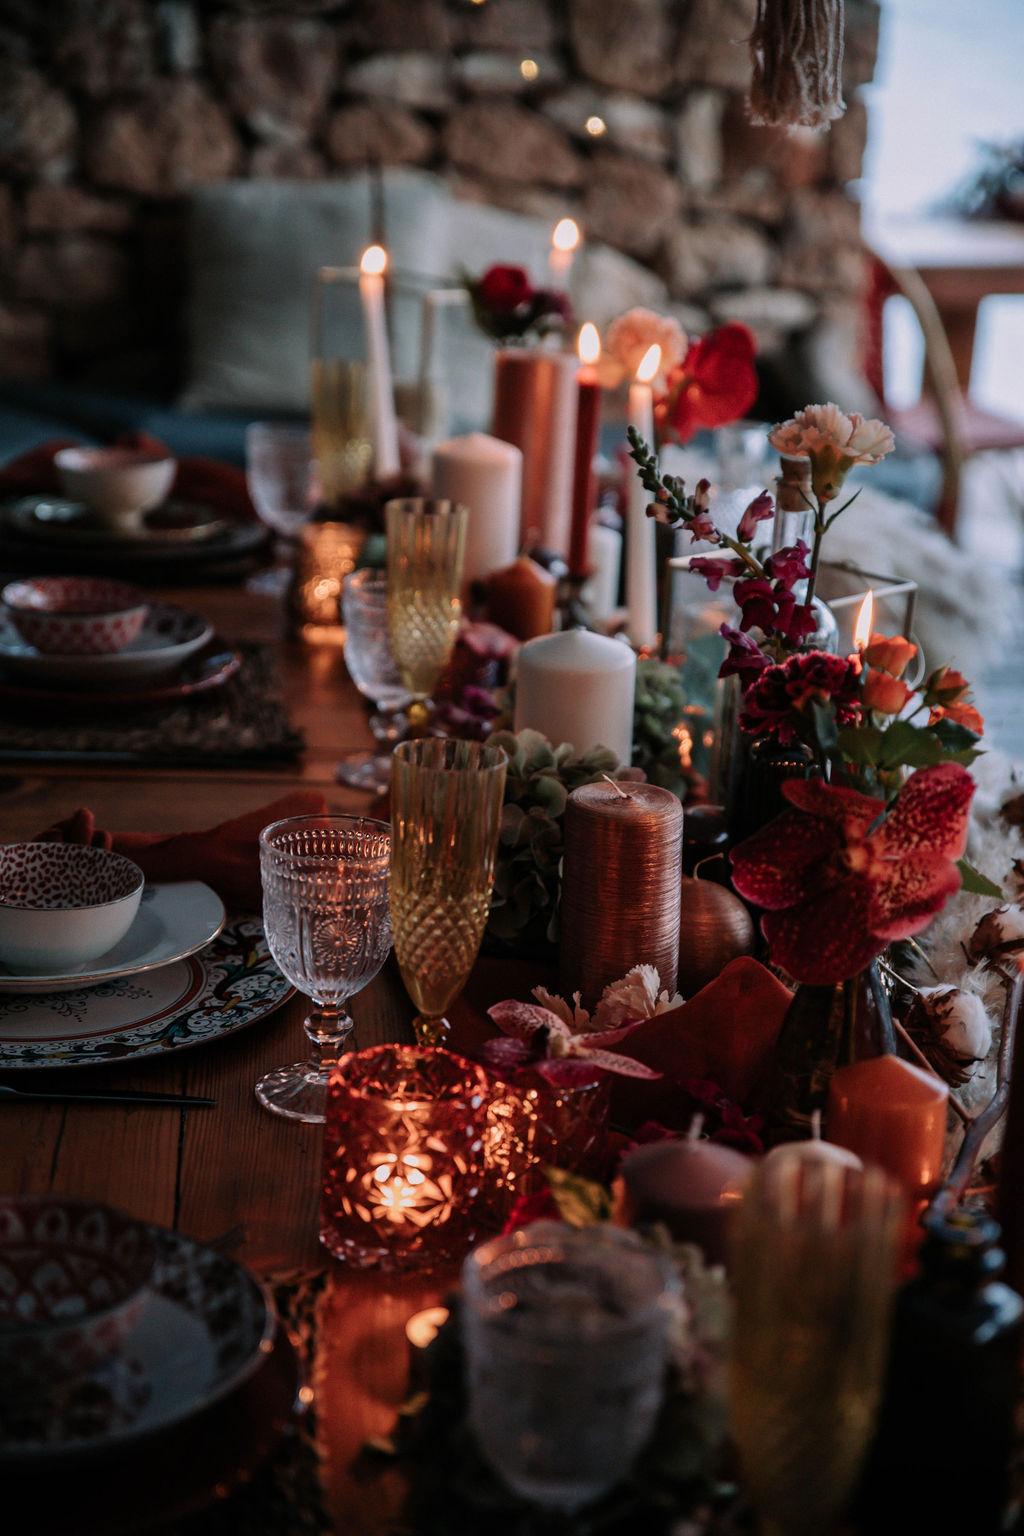 Destination wedding table centrepiece